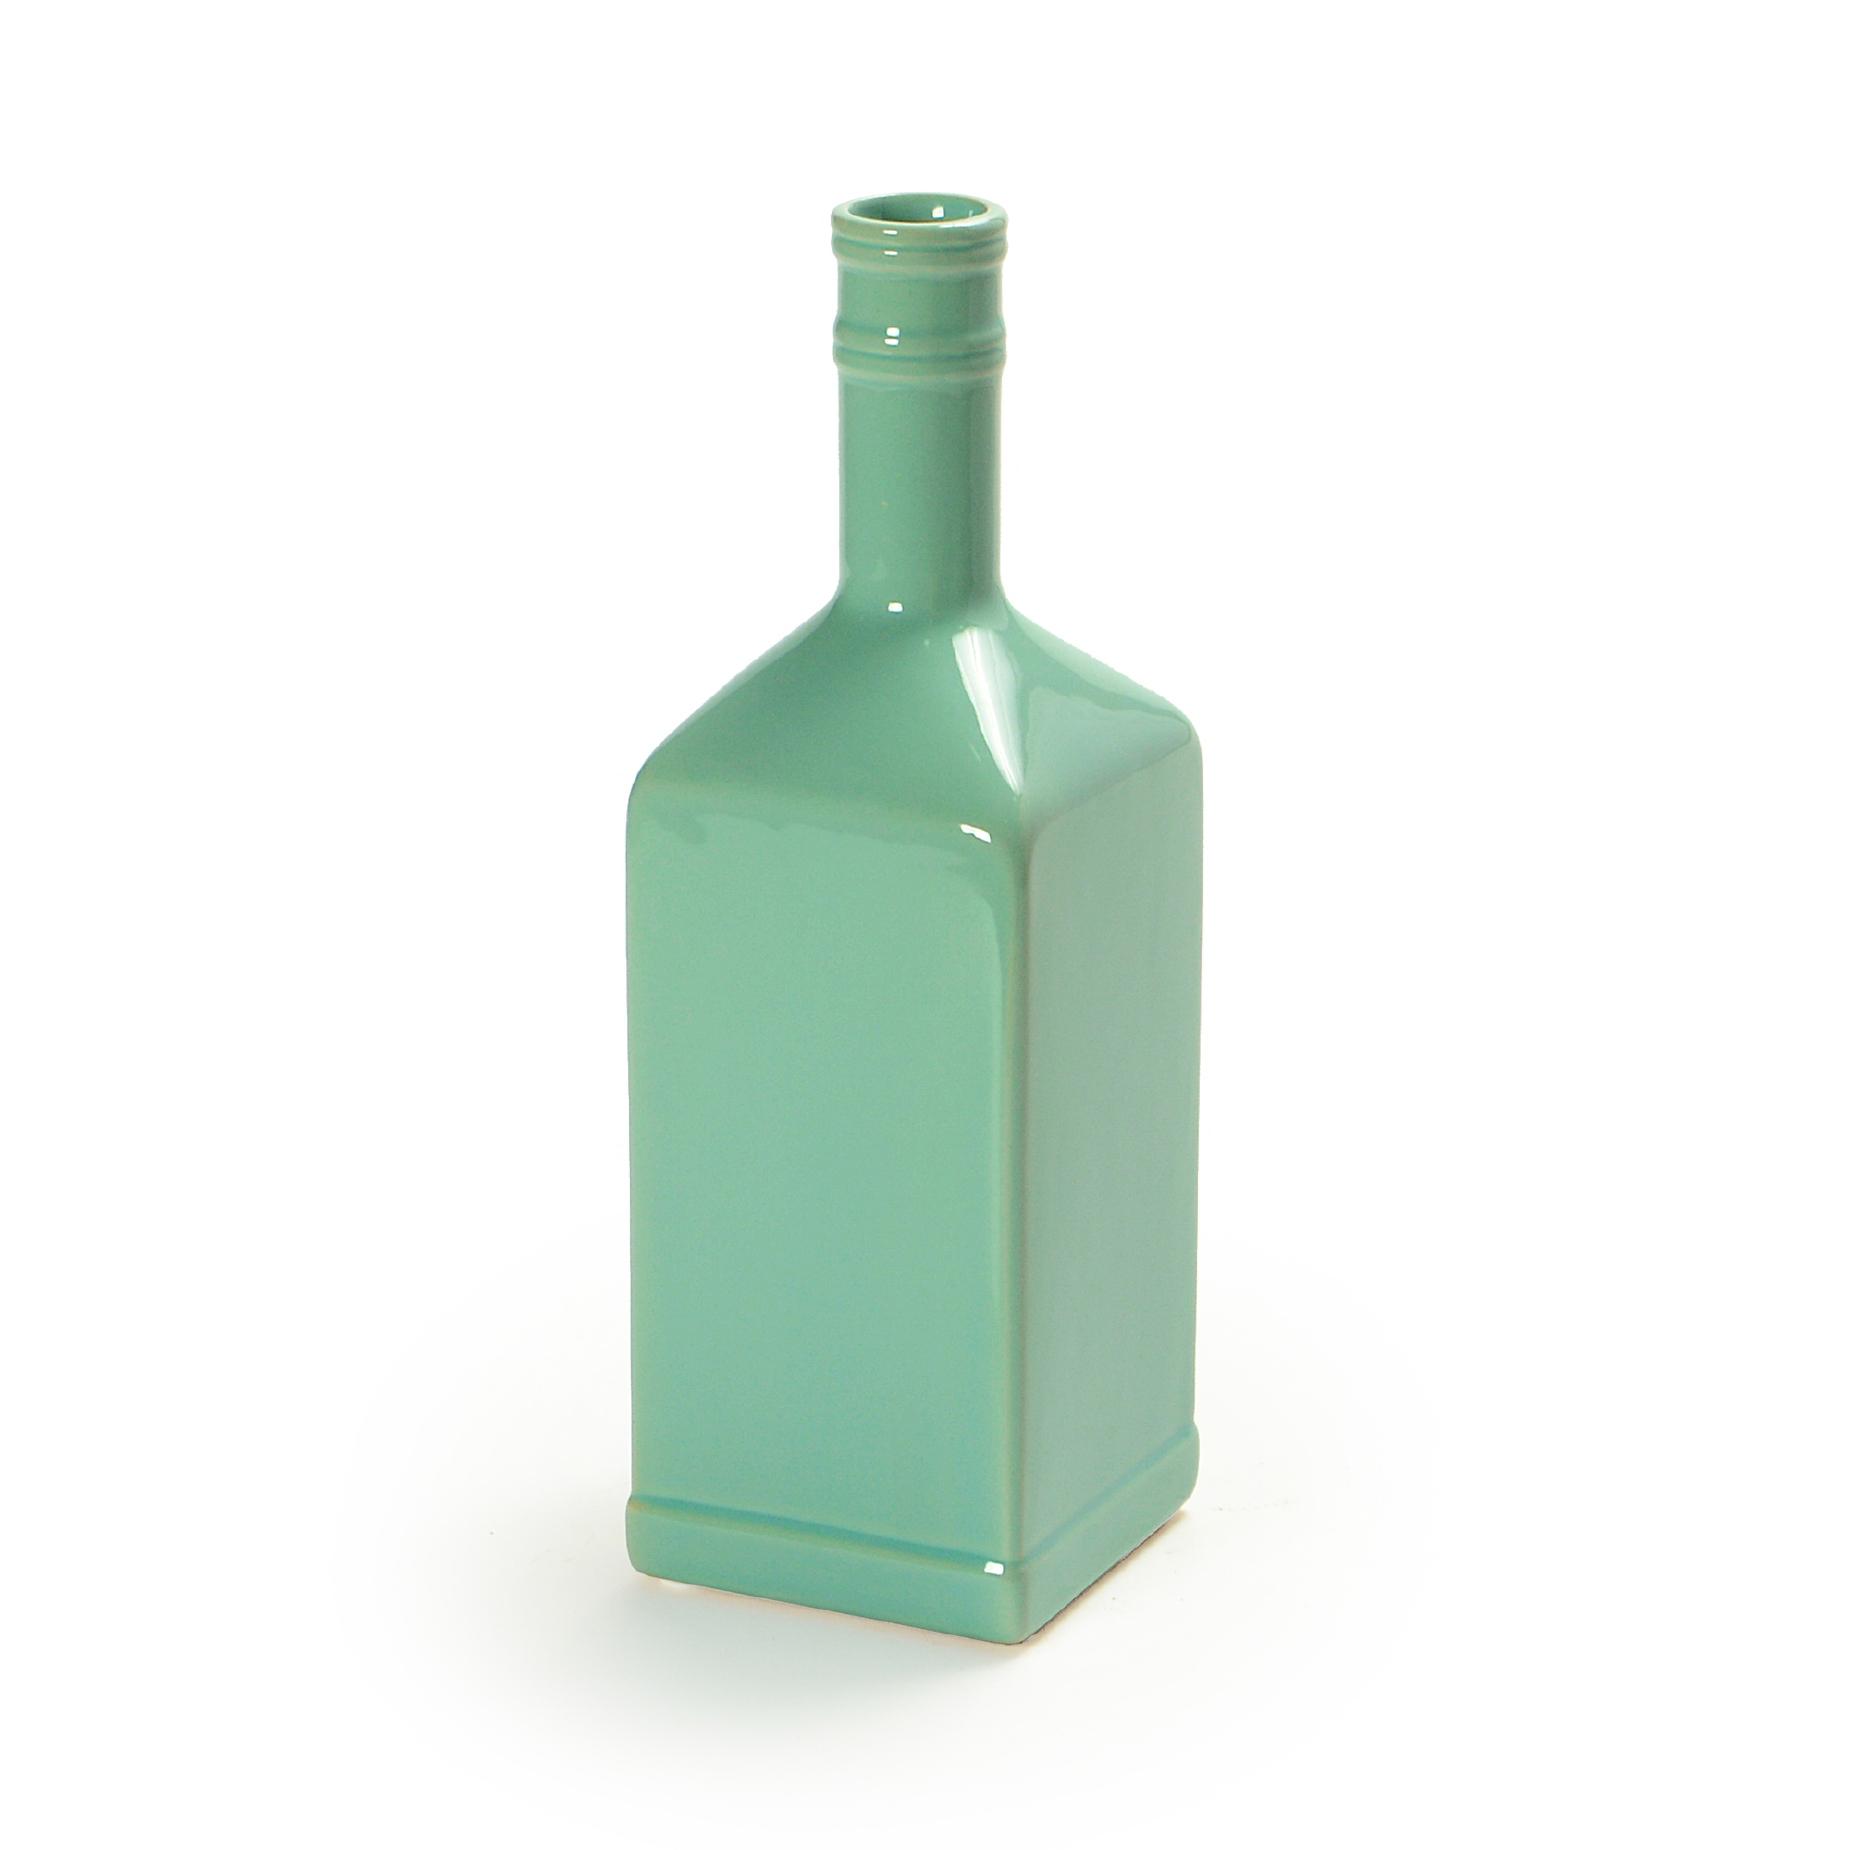 Garrafa de cerâmica Verde